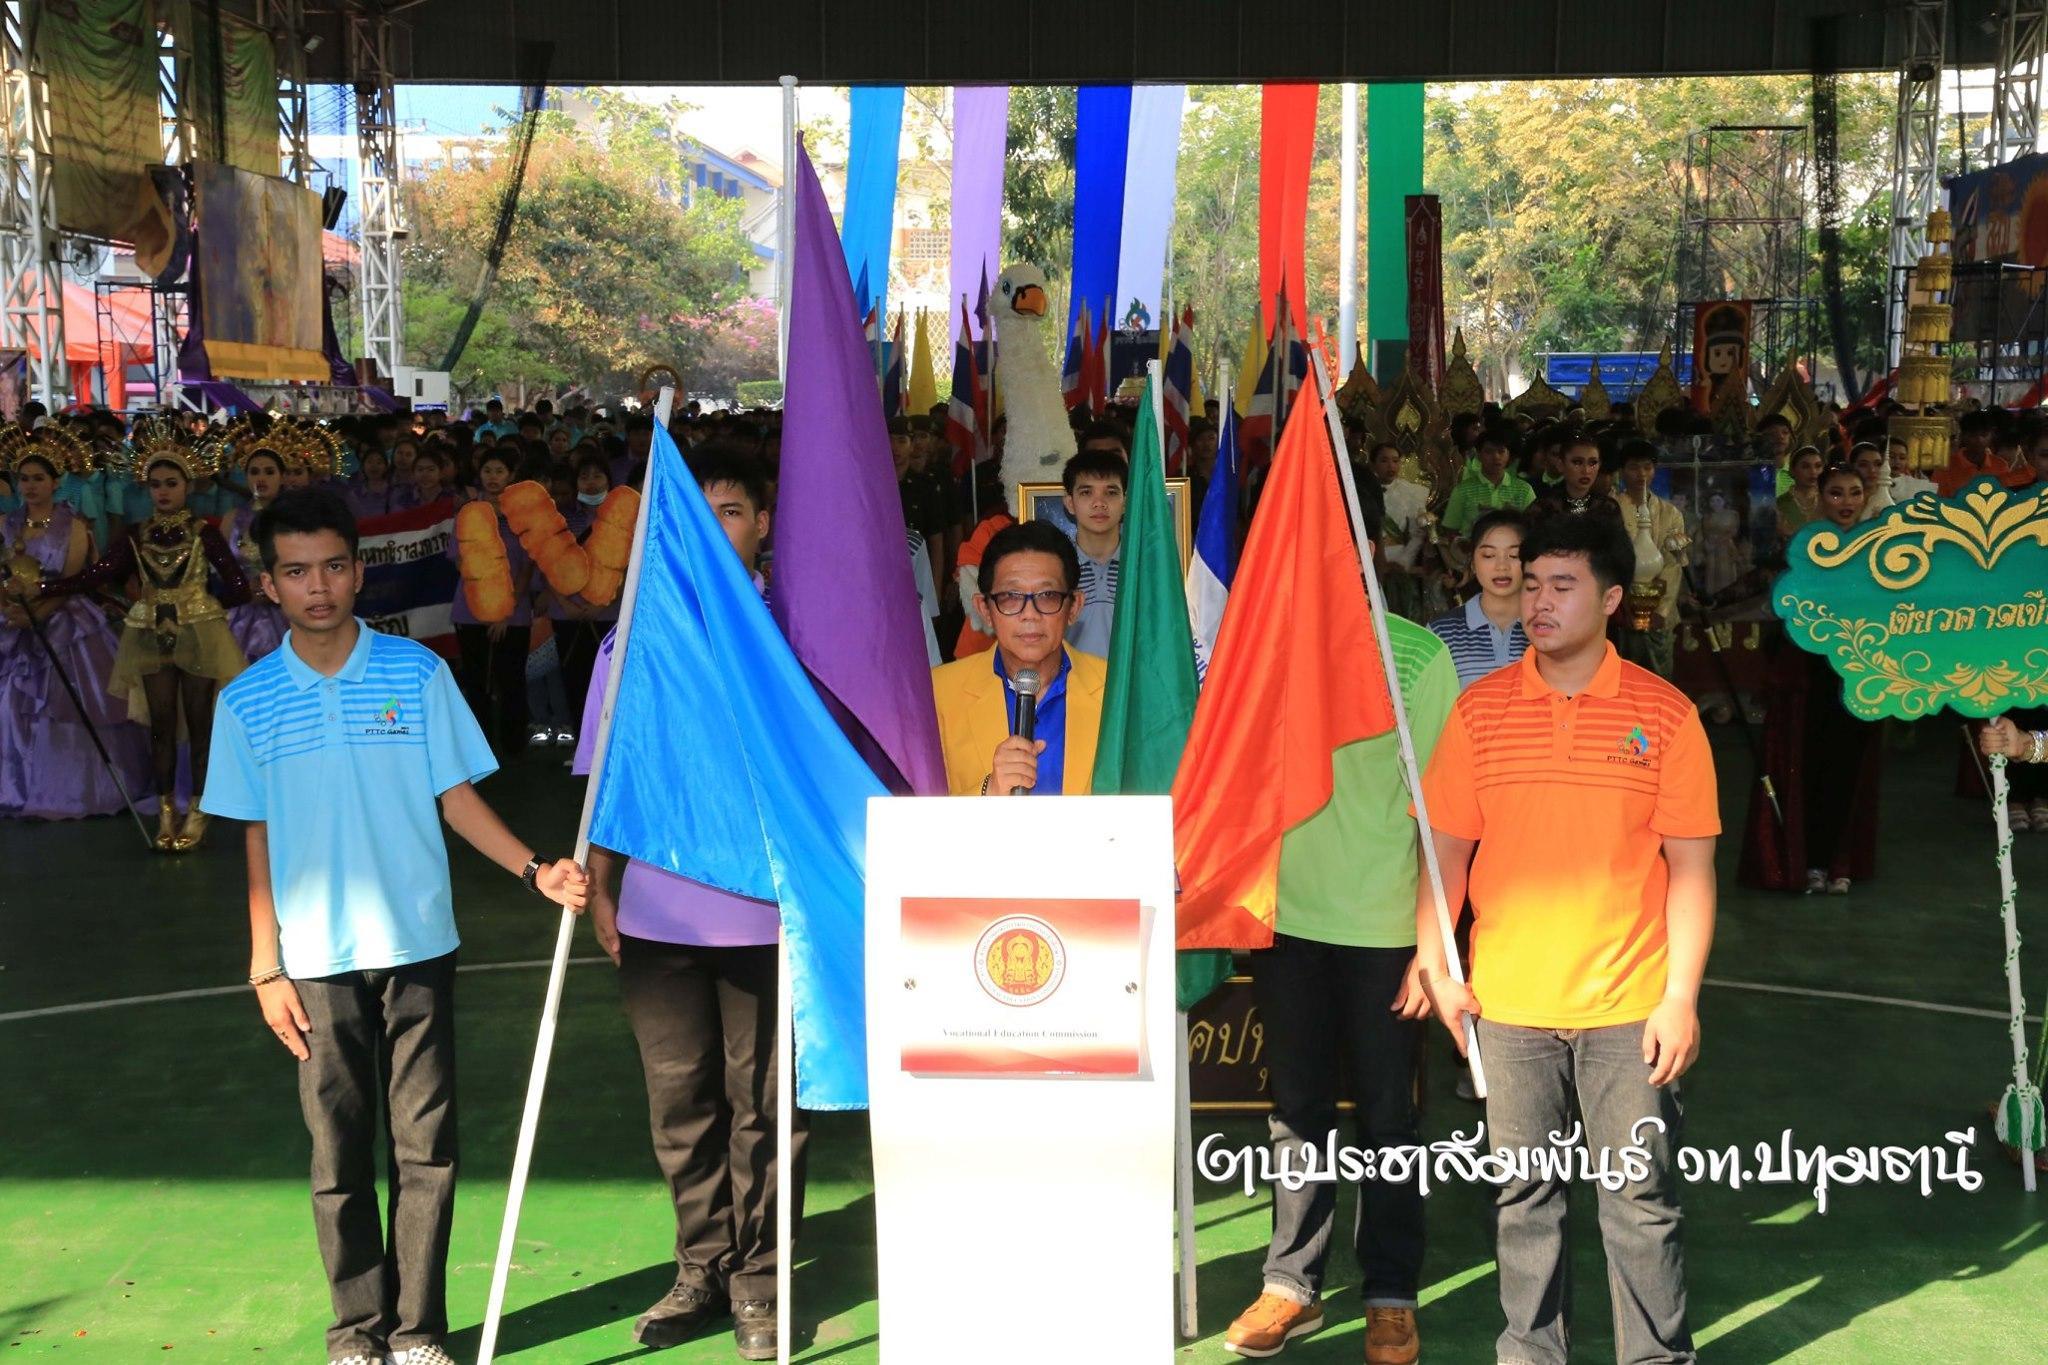 PTTC Sport Day 2019 (ช่วงเช้า) 2563